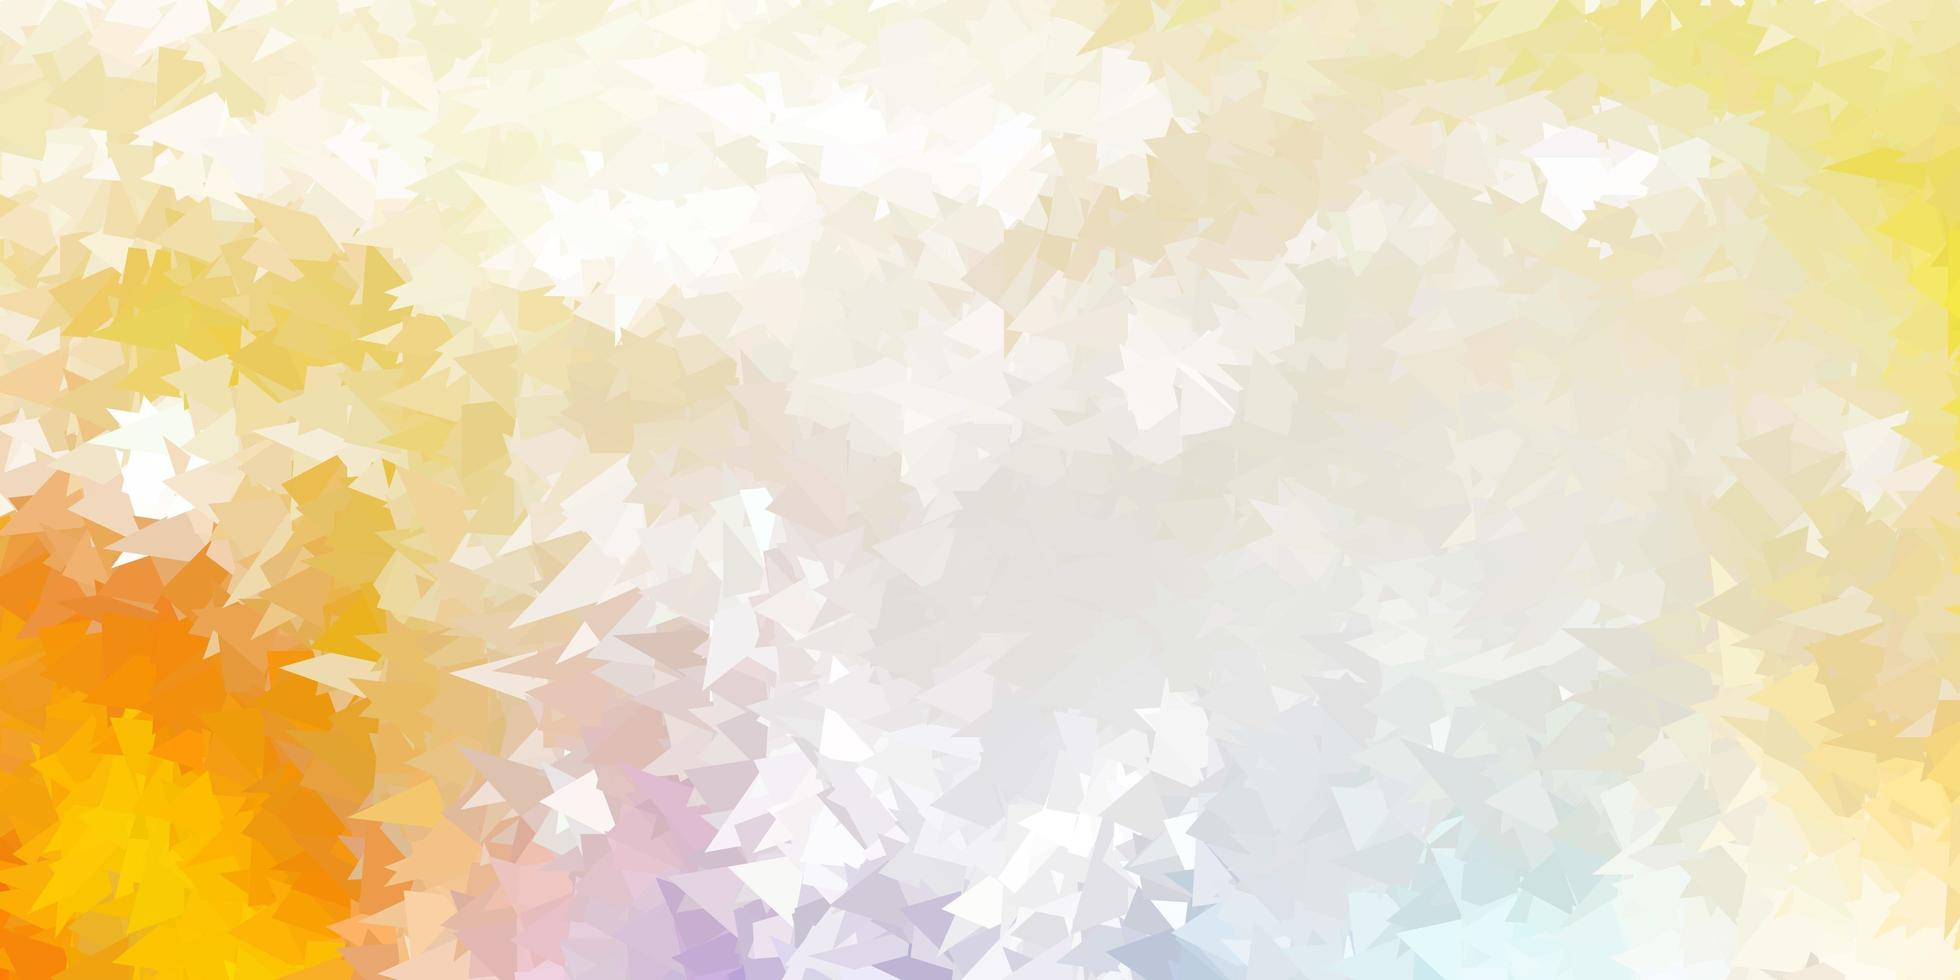 hellblaues, gelbes Vektorverlaufspolygonlayout. vektor